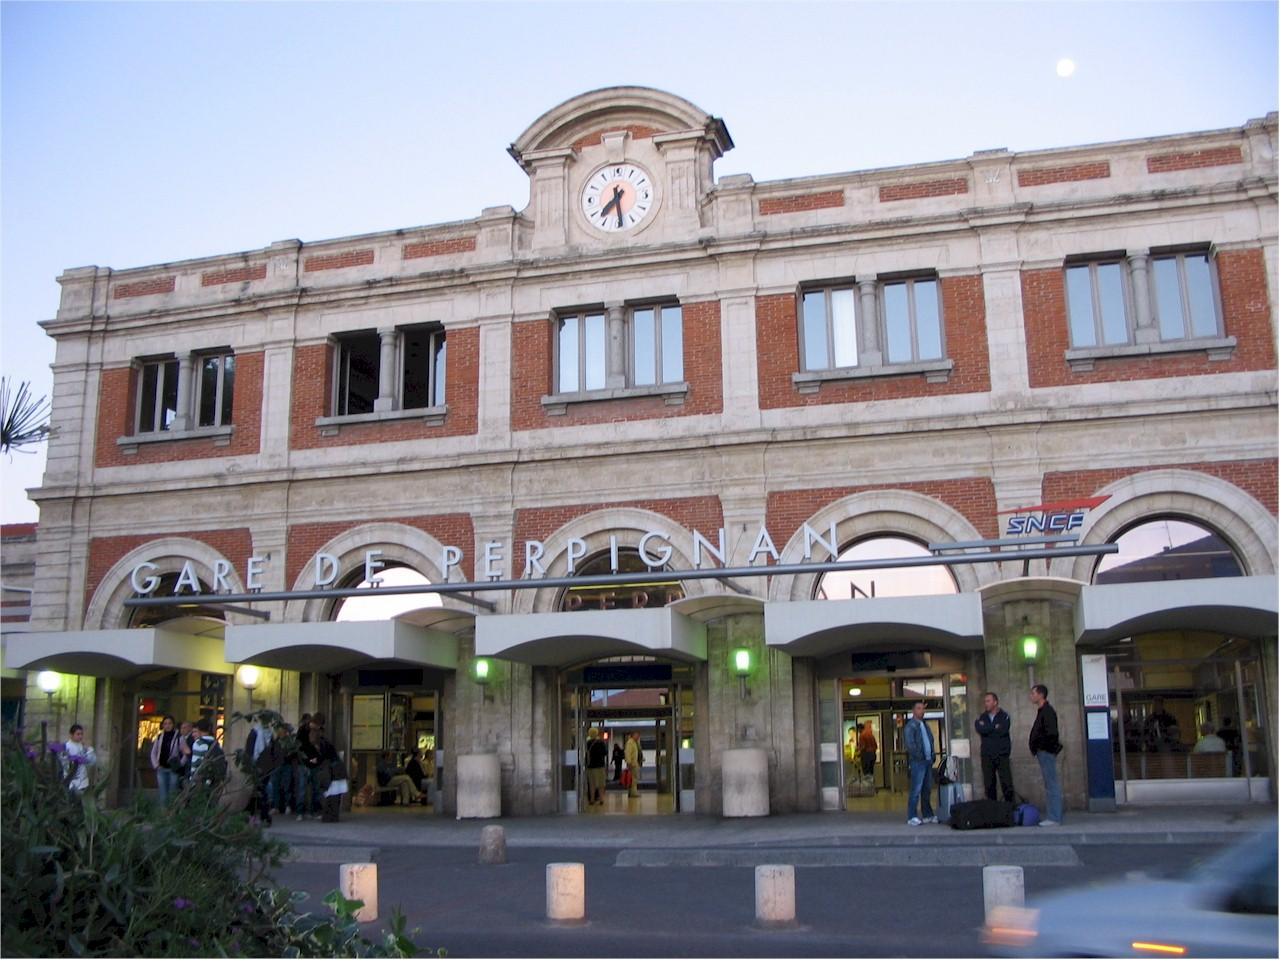 perpignan-train-station